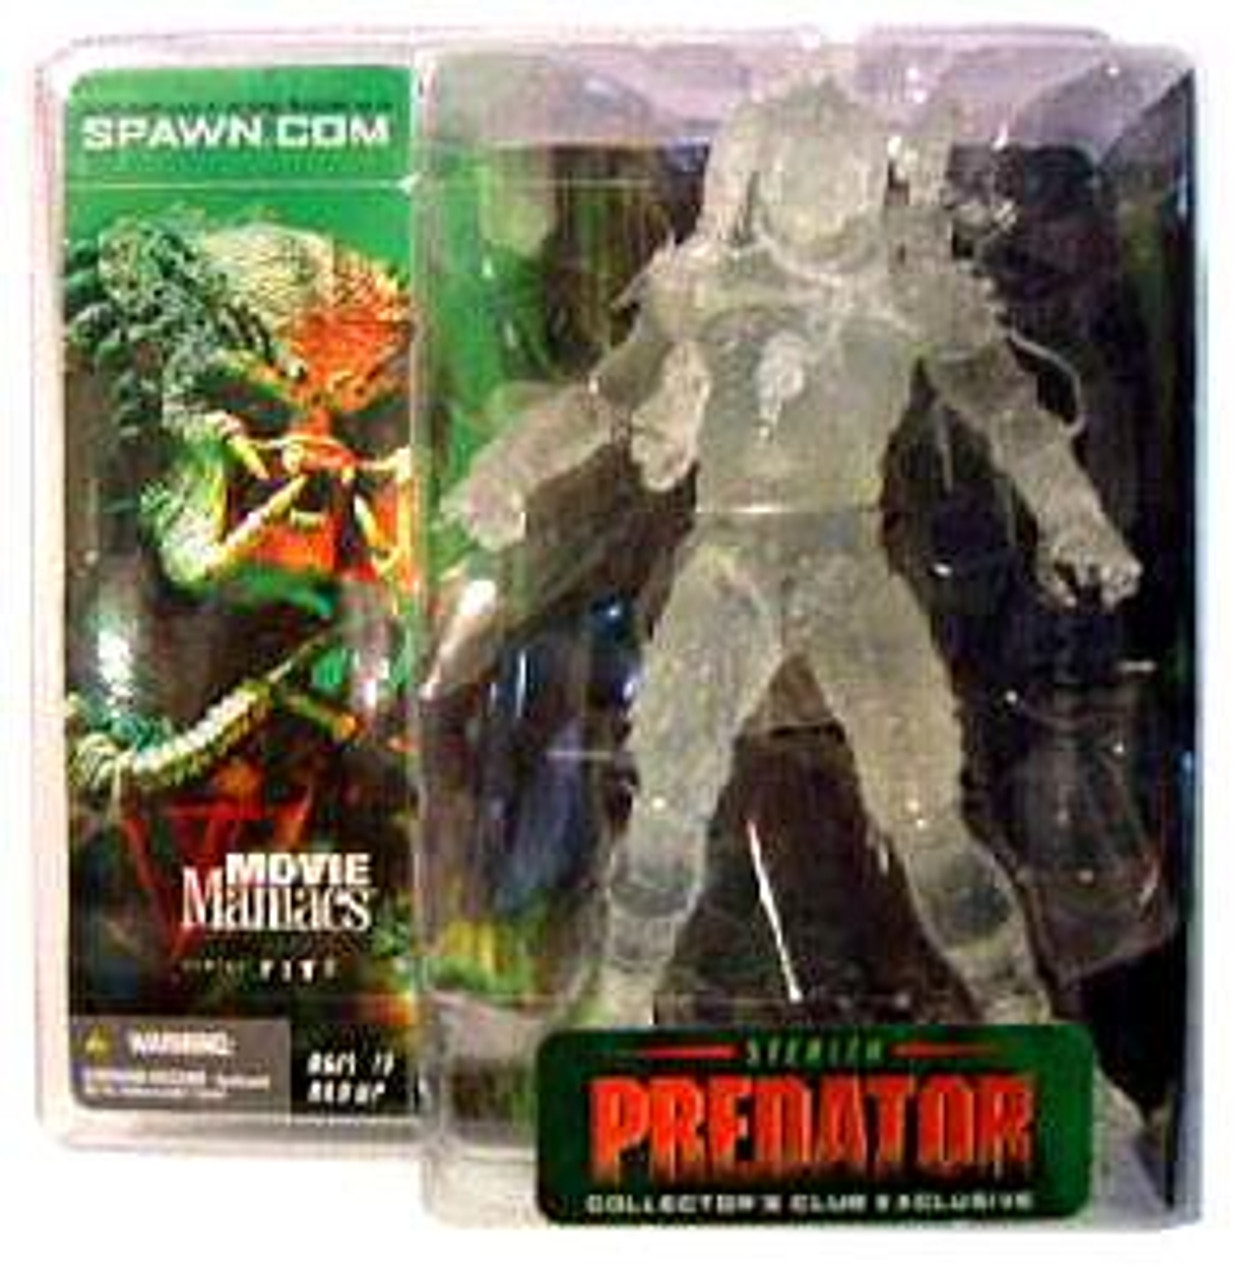 McFarlane Toys Movie Maniacs Series 5 Stealth Predator Exclusive Action Figure